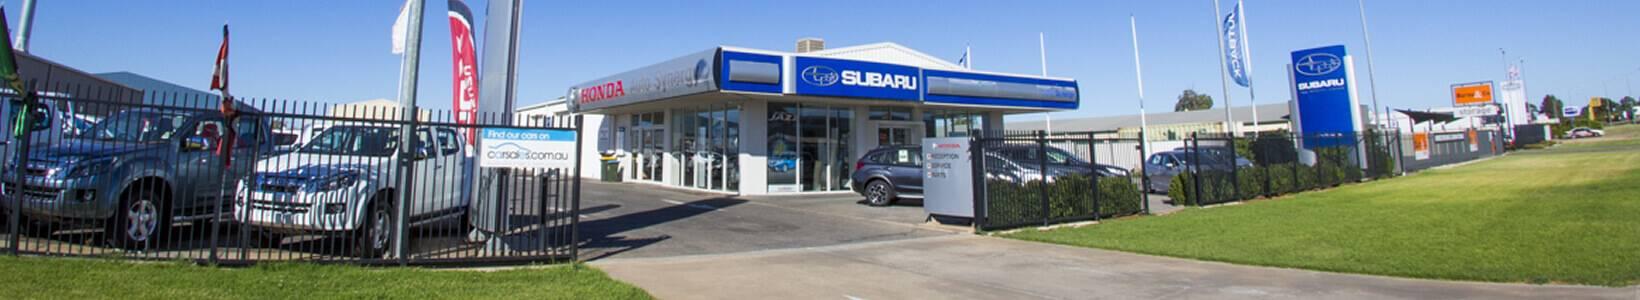 Autosynergy Subaru